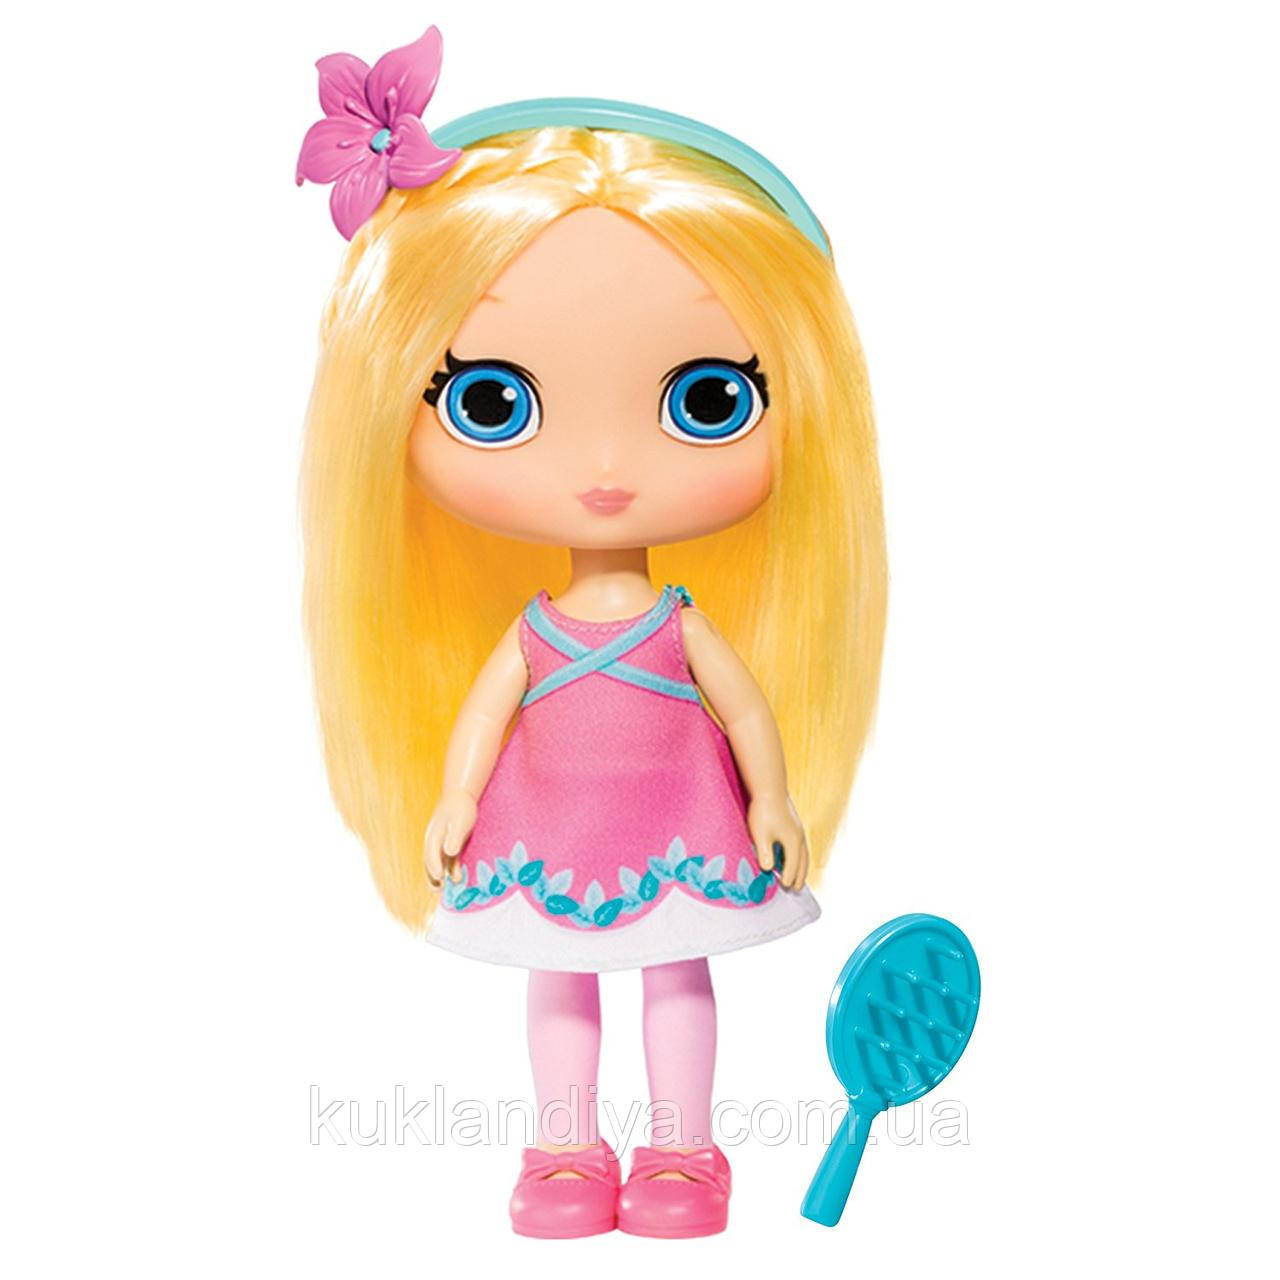 Лялька Пози Little Charmers Posie 18 див.